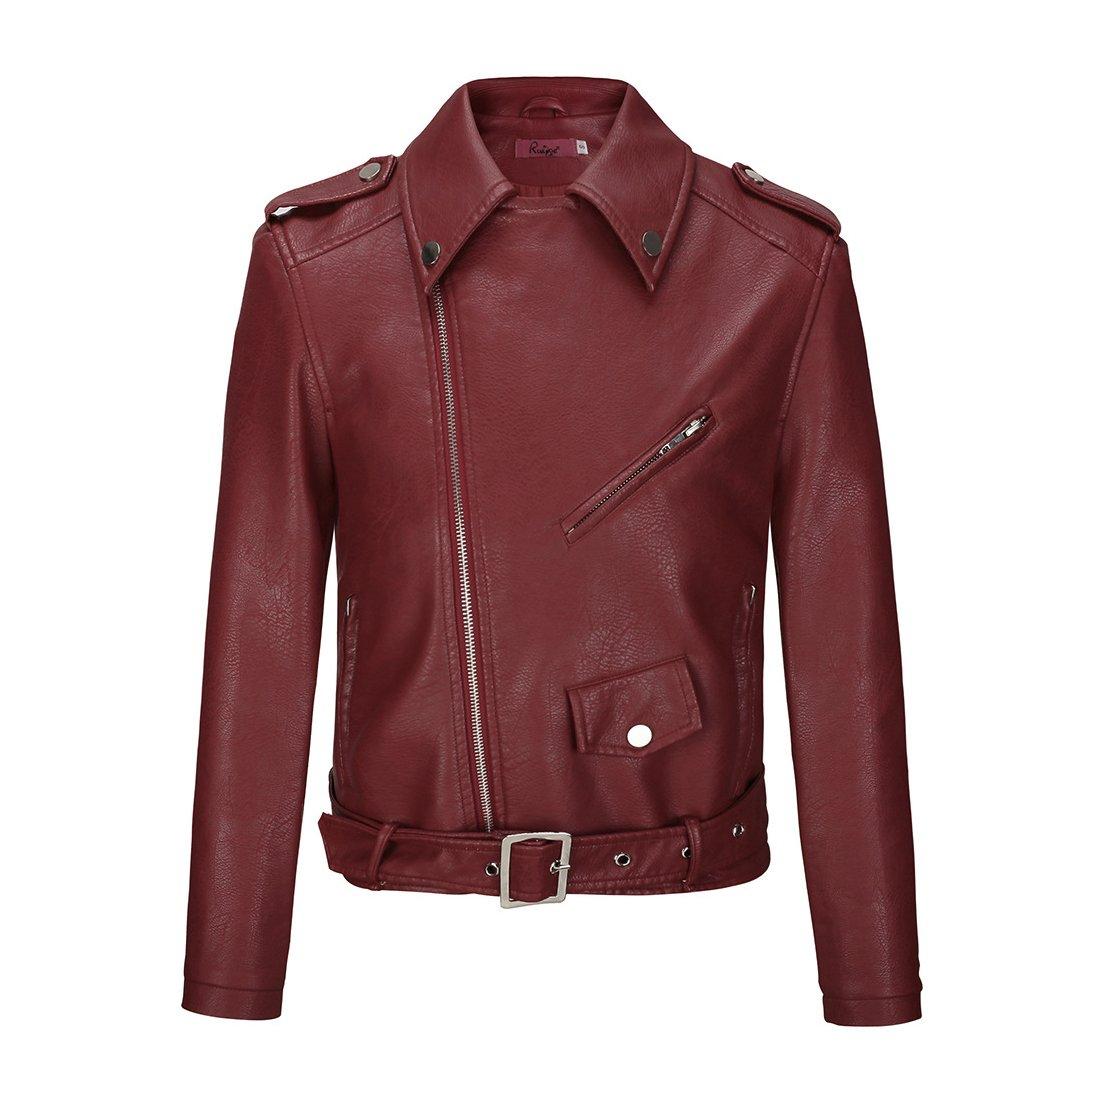 LOKTARC Women's Faux Leather Moto Biker Zip Up Short Jackets with Belt